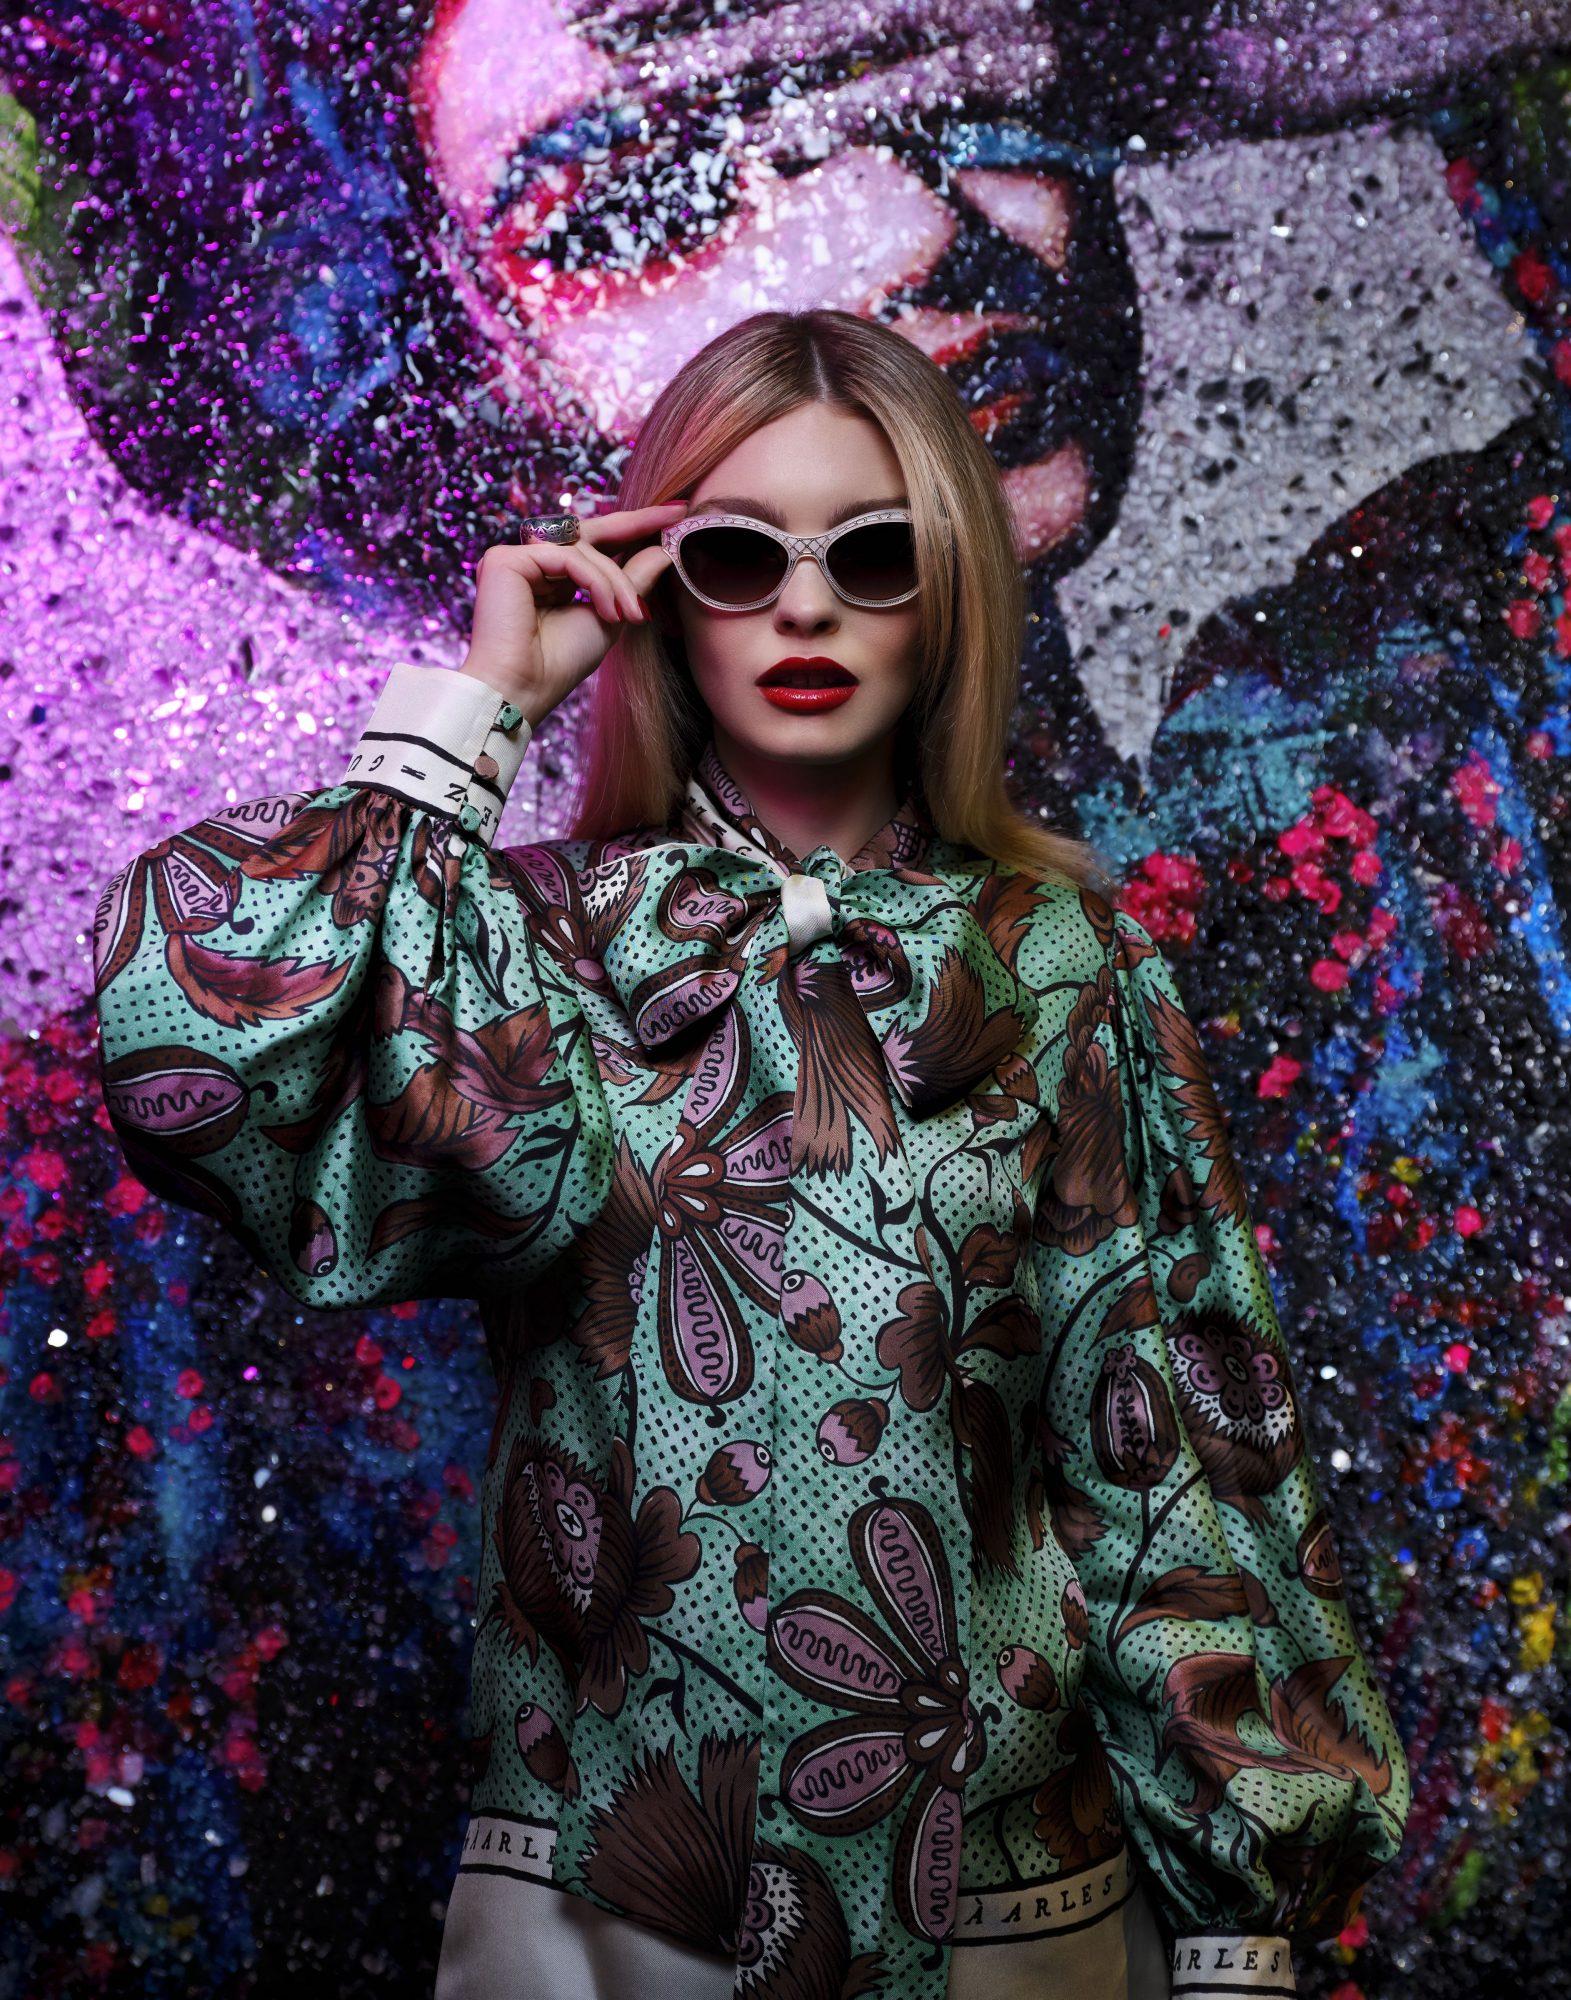 Meet Julia Garner Ozark S Breakout Star And Fashion S: Meet Julia Perry - Voyage LA Magazine